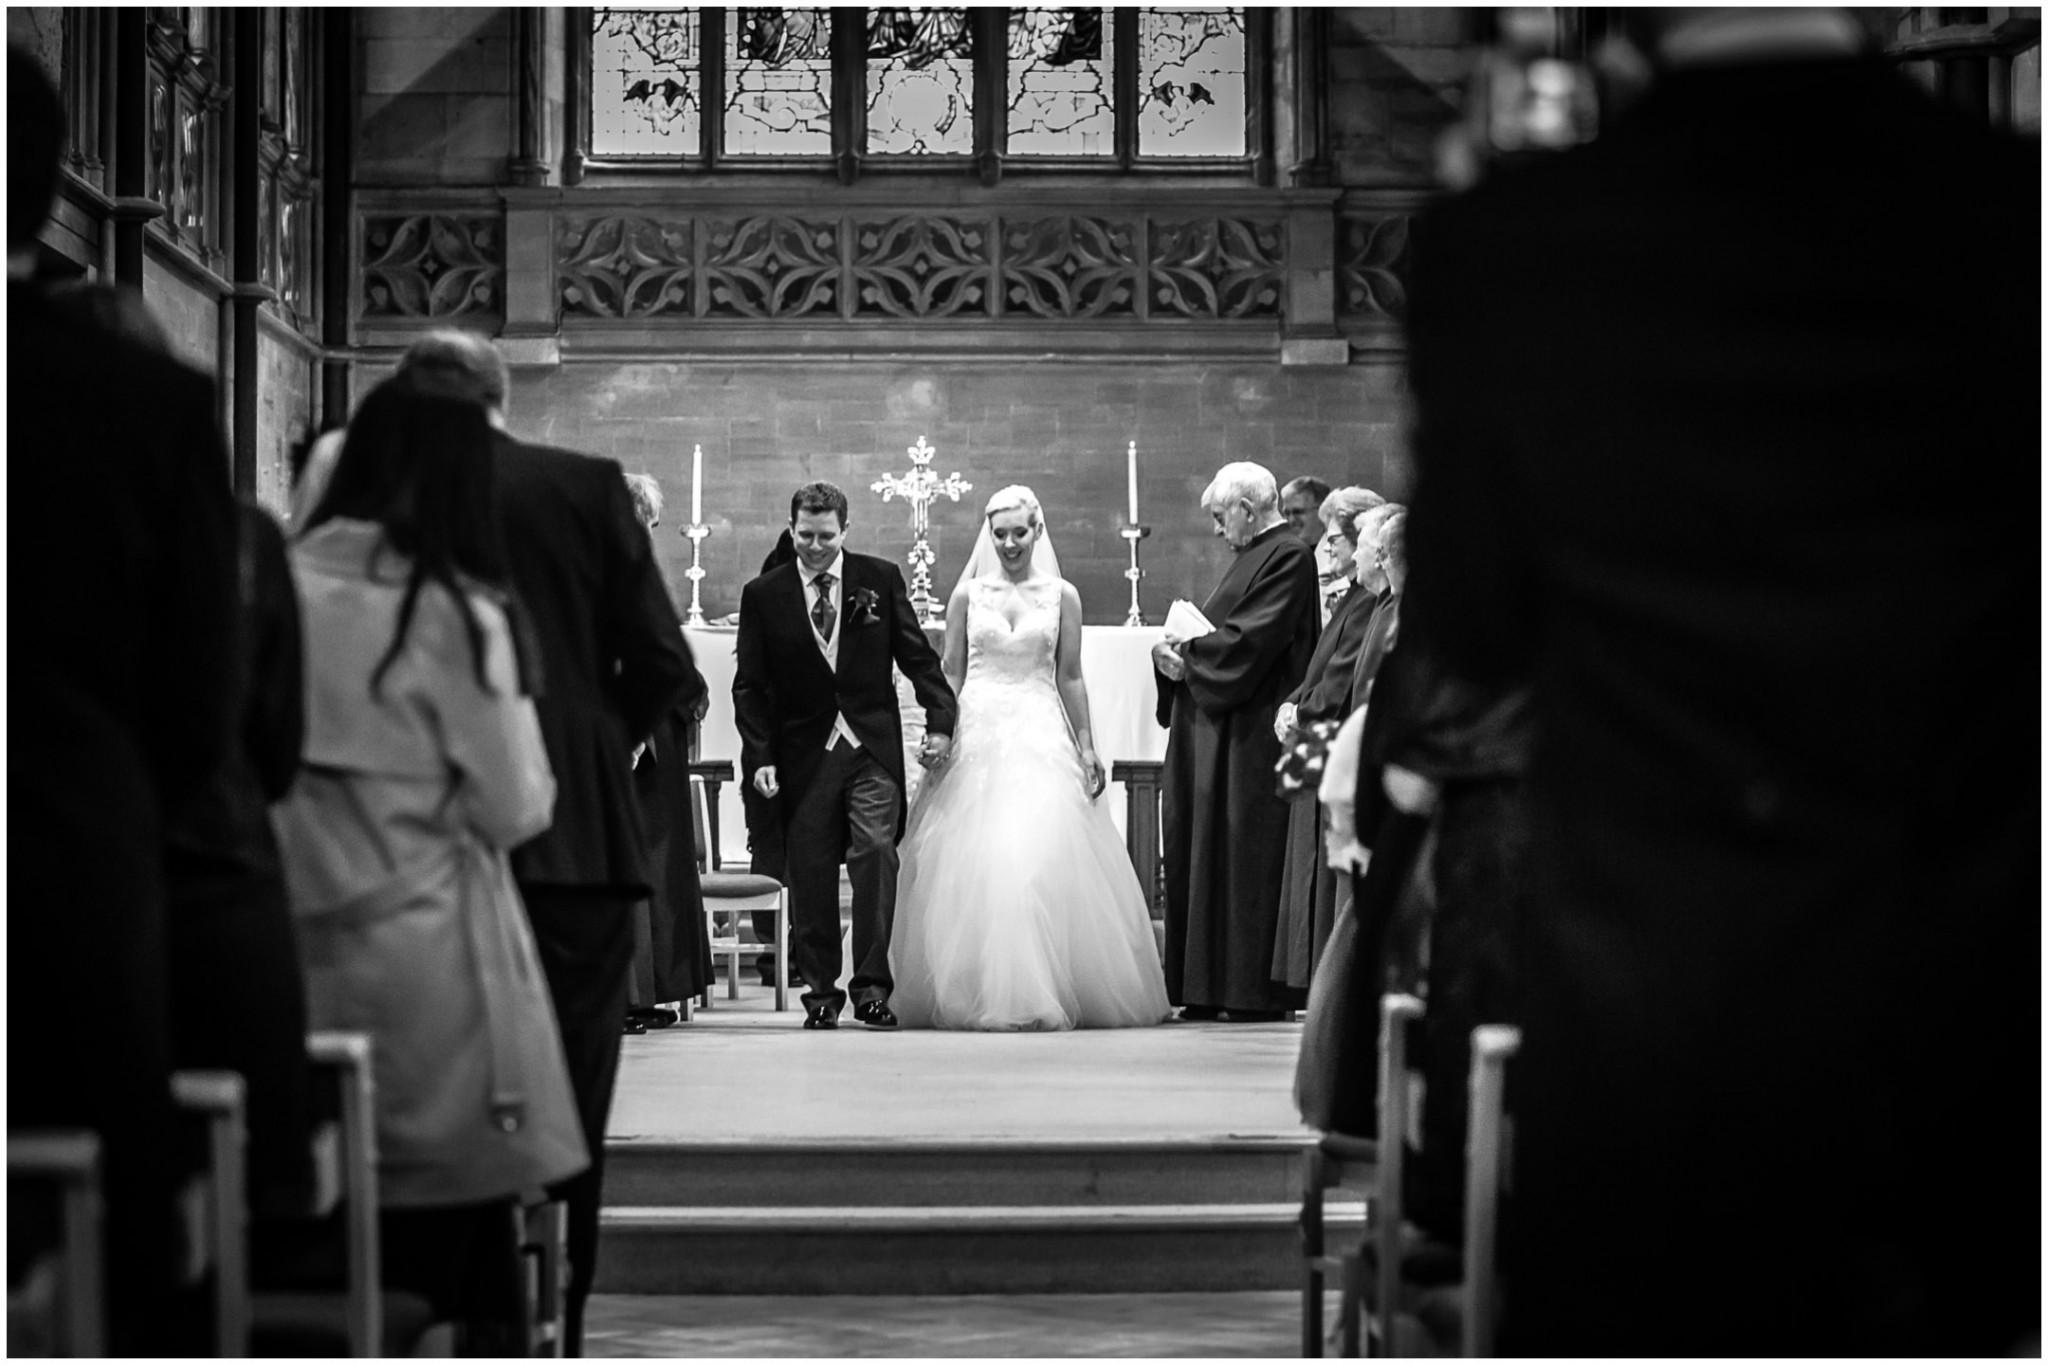 St Saviours Church Brockenhurst Bride & Groom walk down the aisle